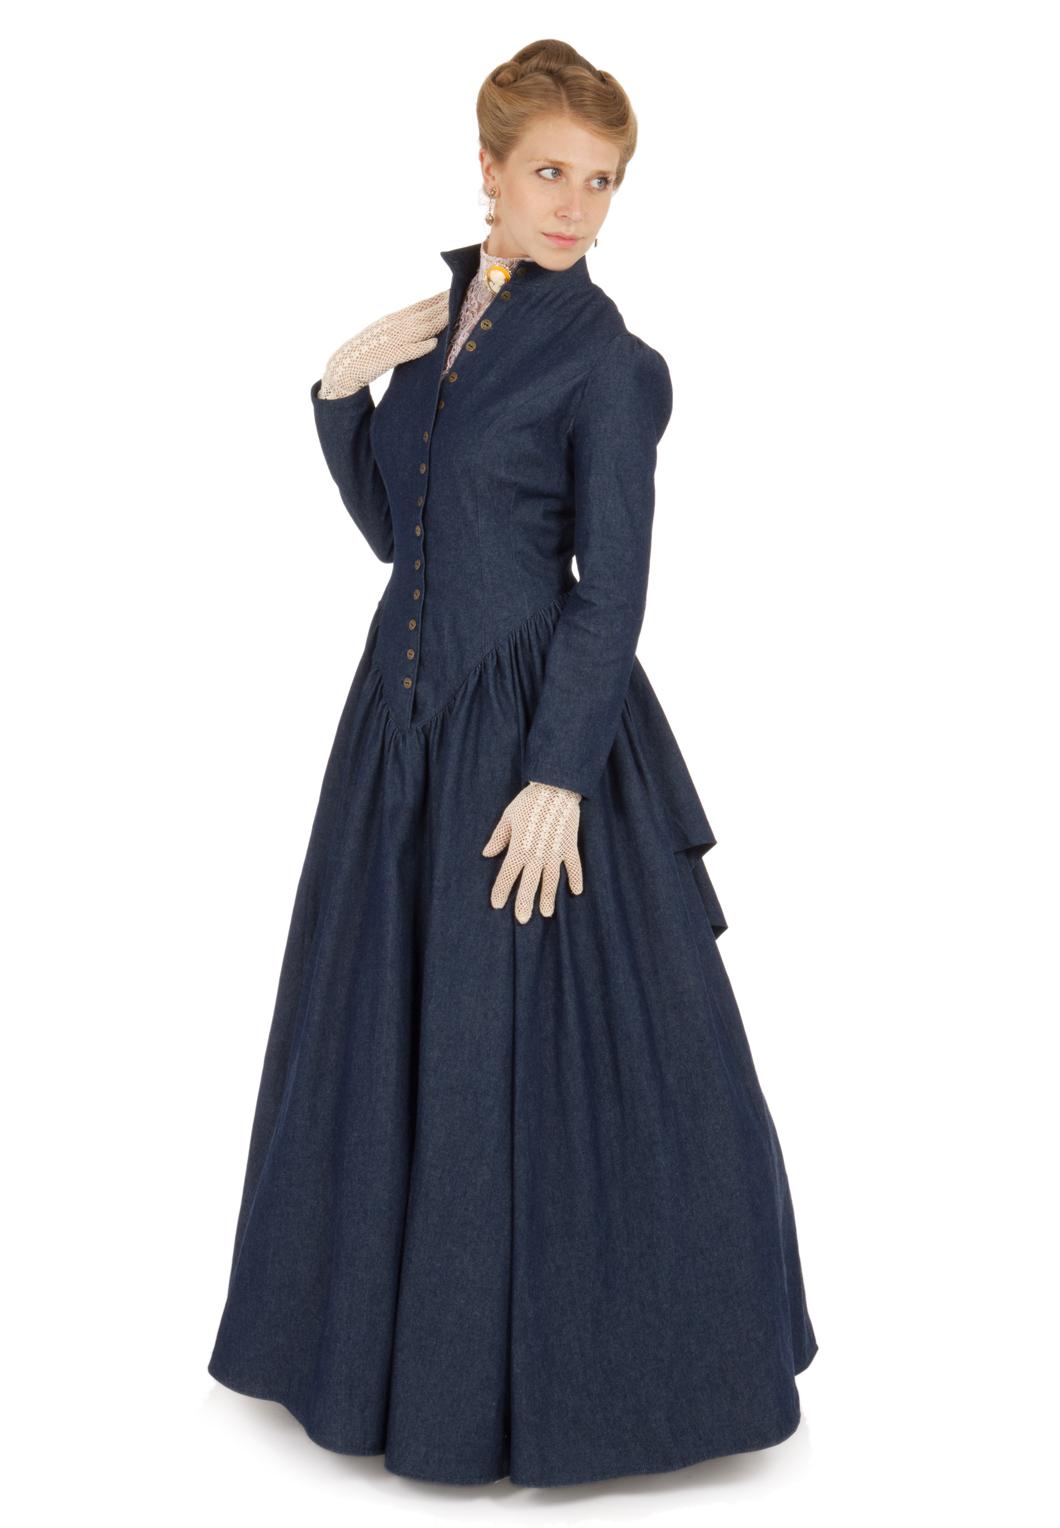 Retta Victorian Denim Dress   Recollections